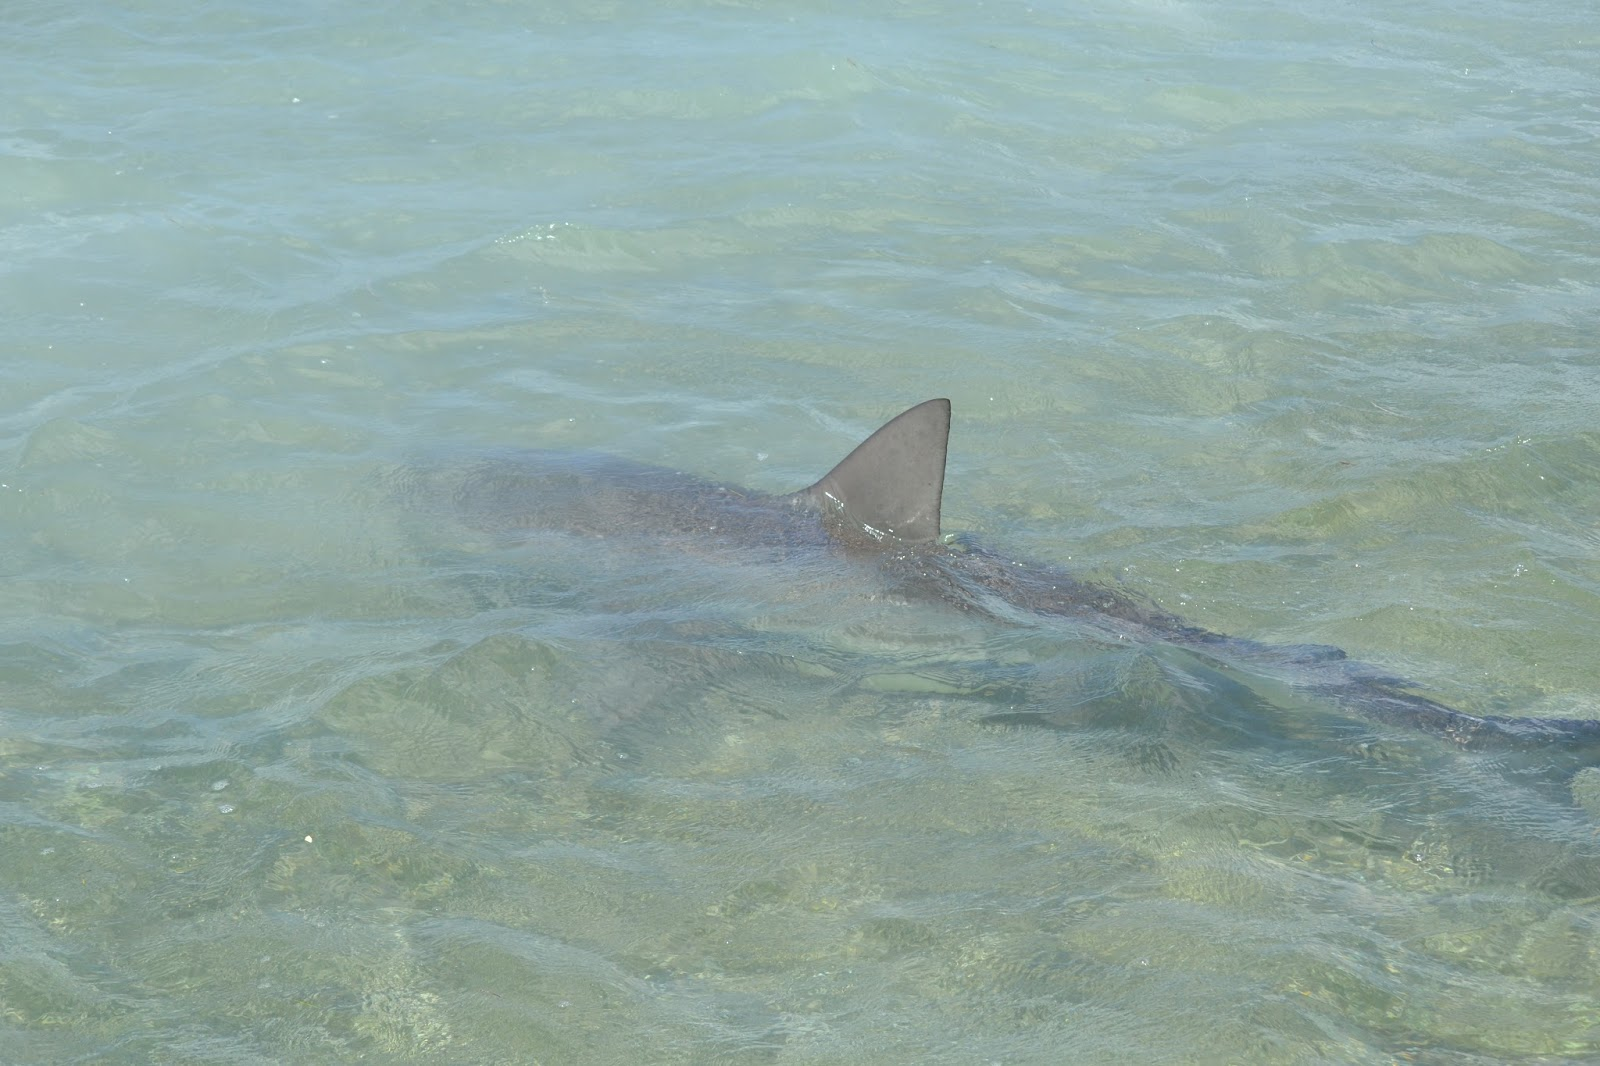 The Pine Island Angler: Key West Shark Attack